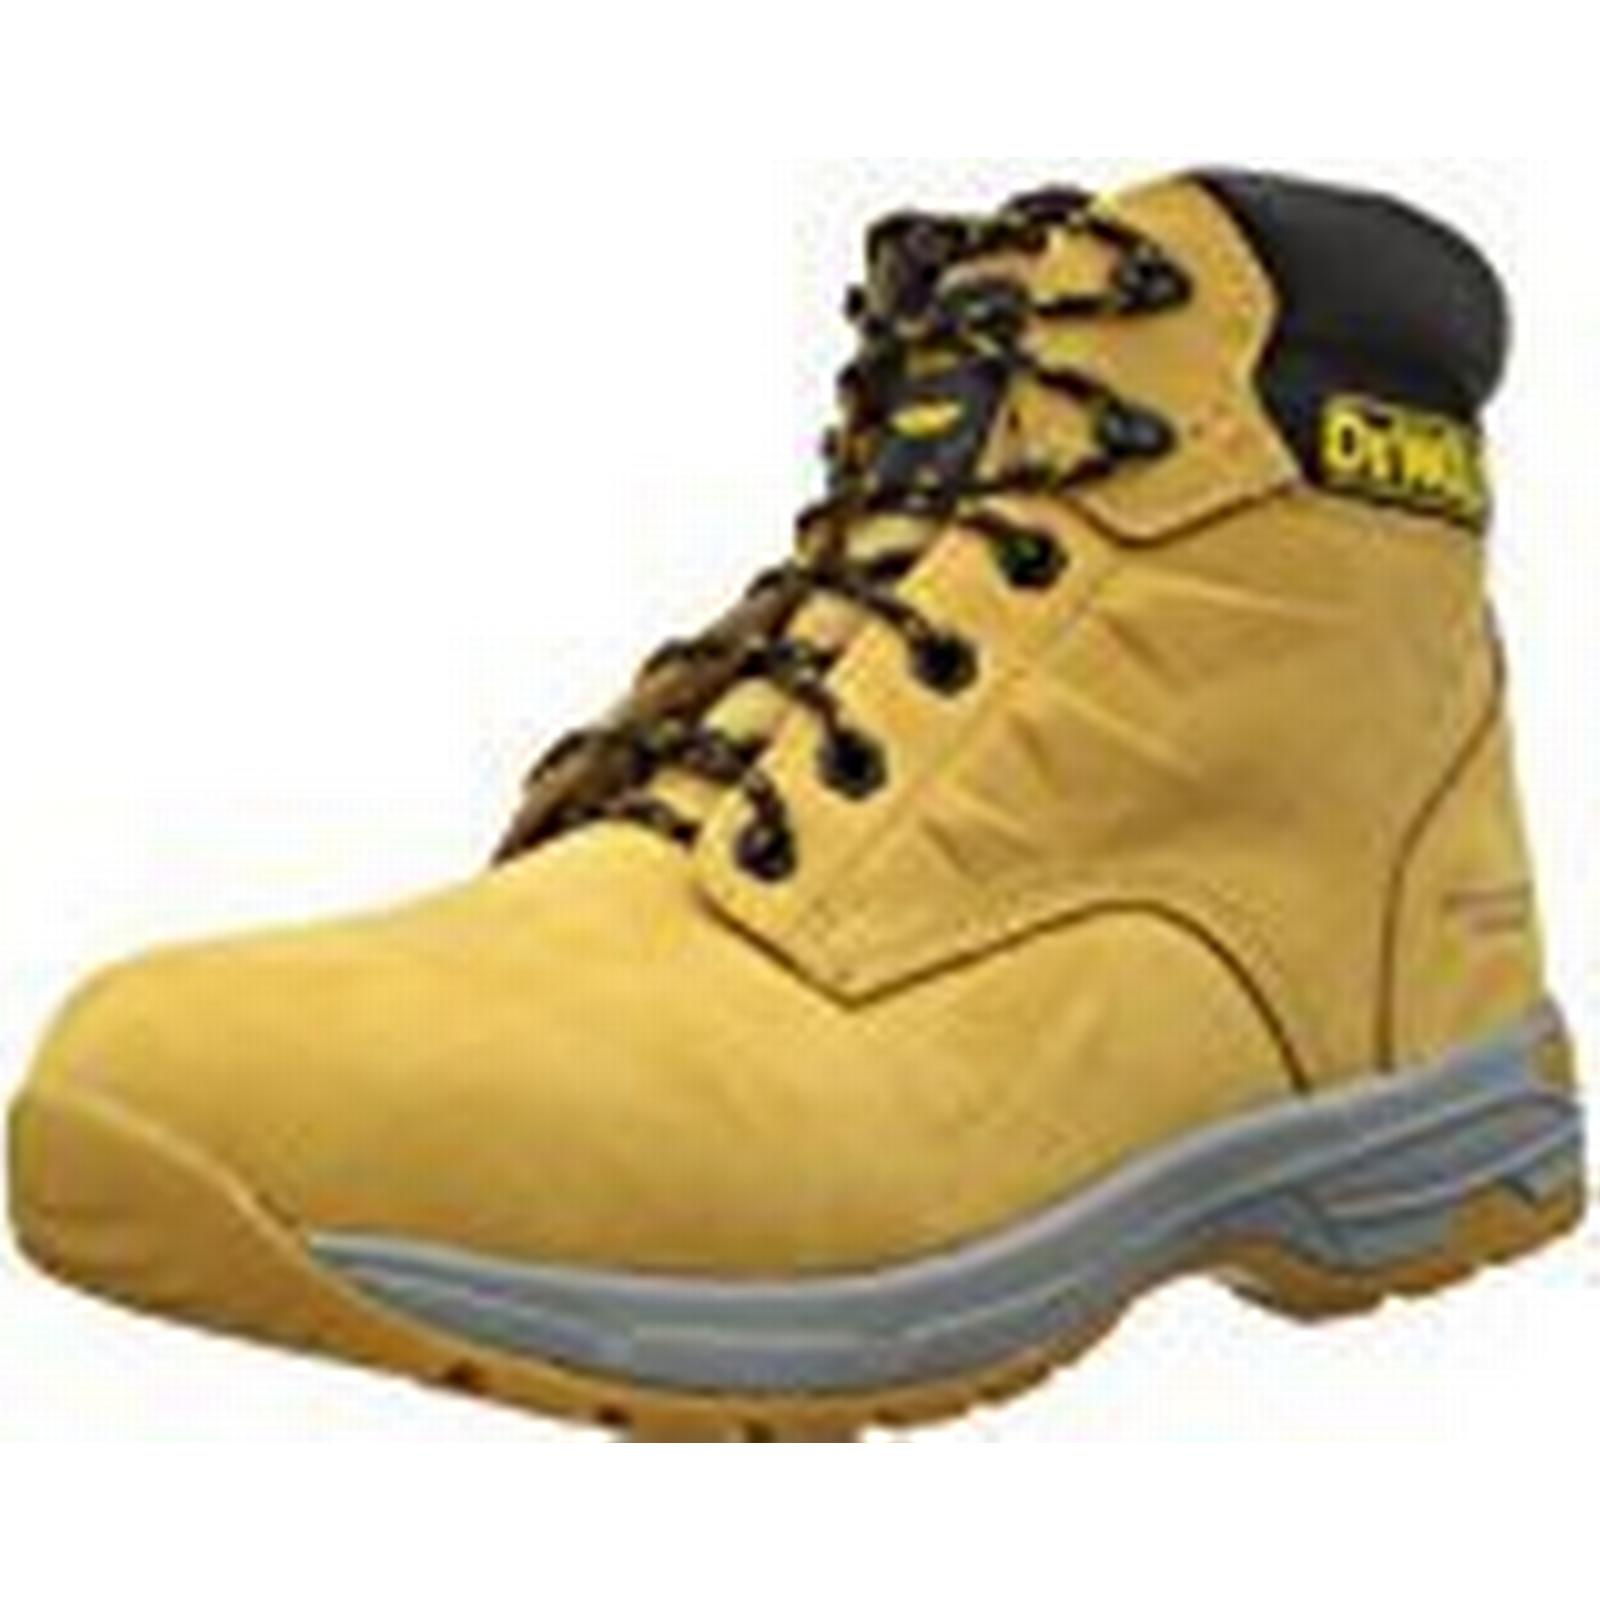 DeWALT Men's UK Carbon Boots Honey 11 UK Men's a6f678